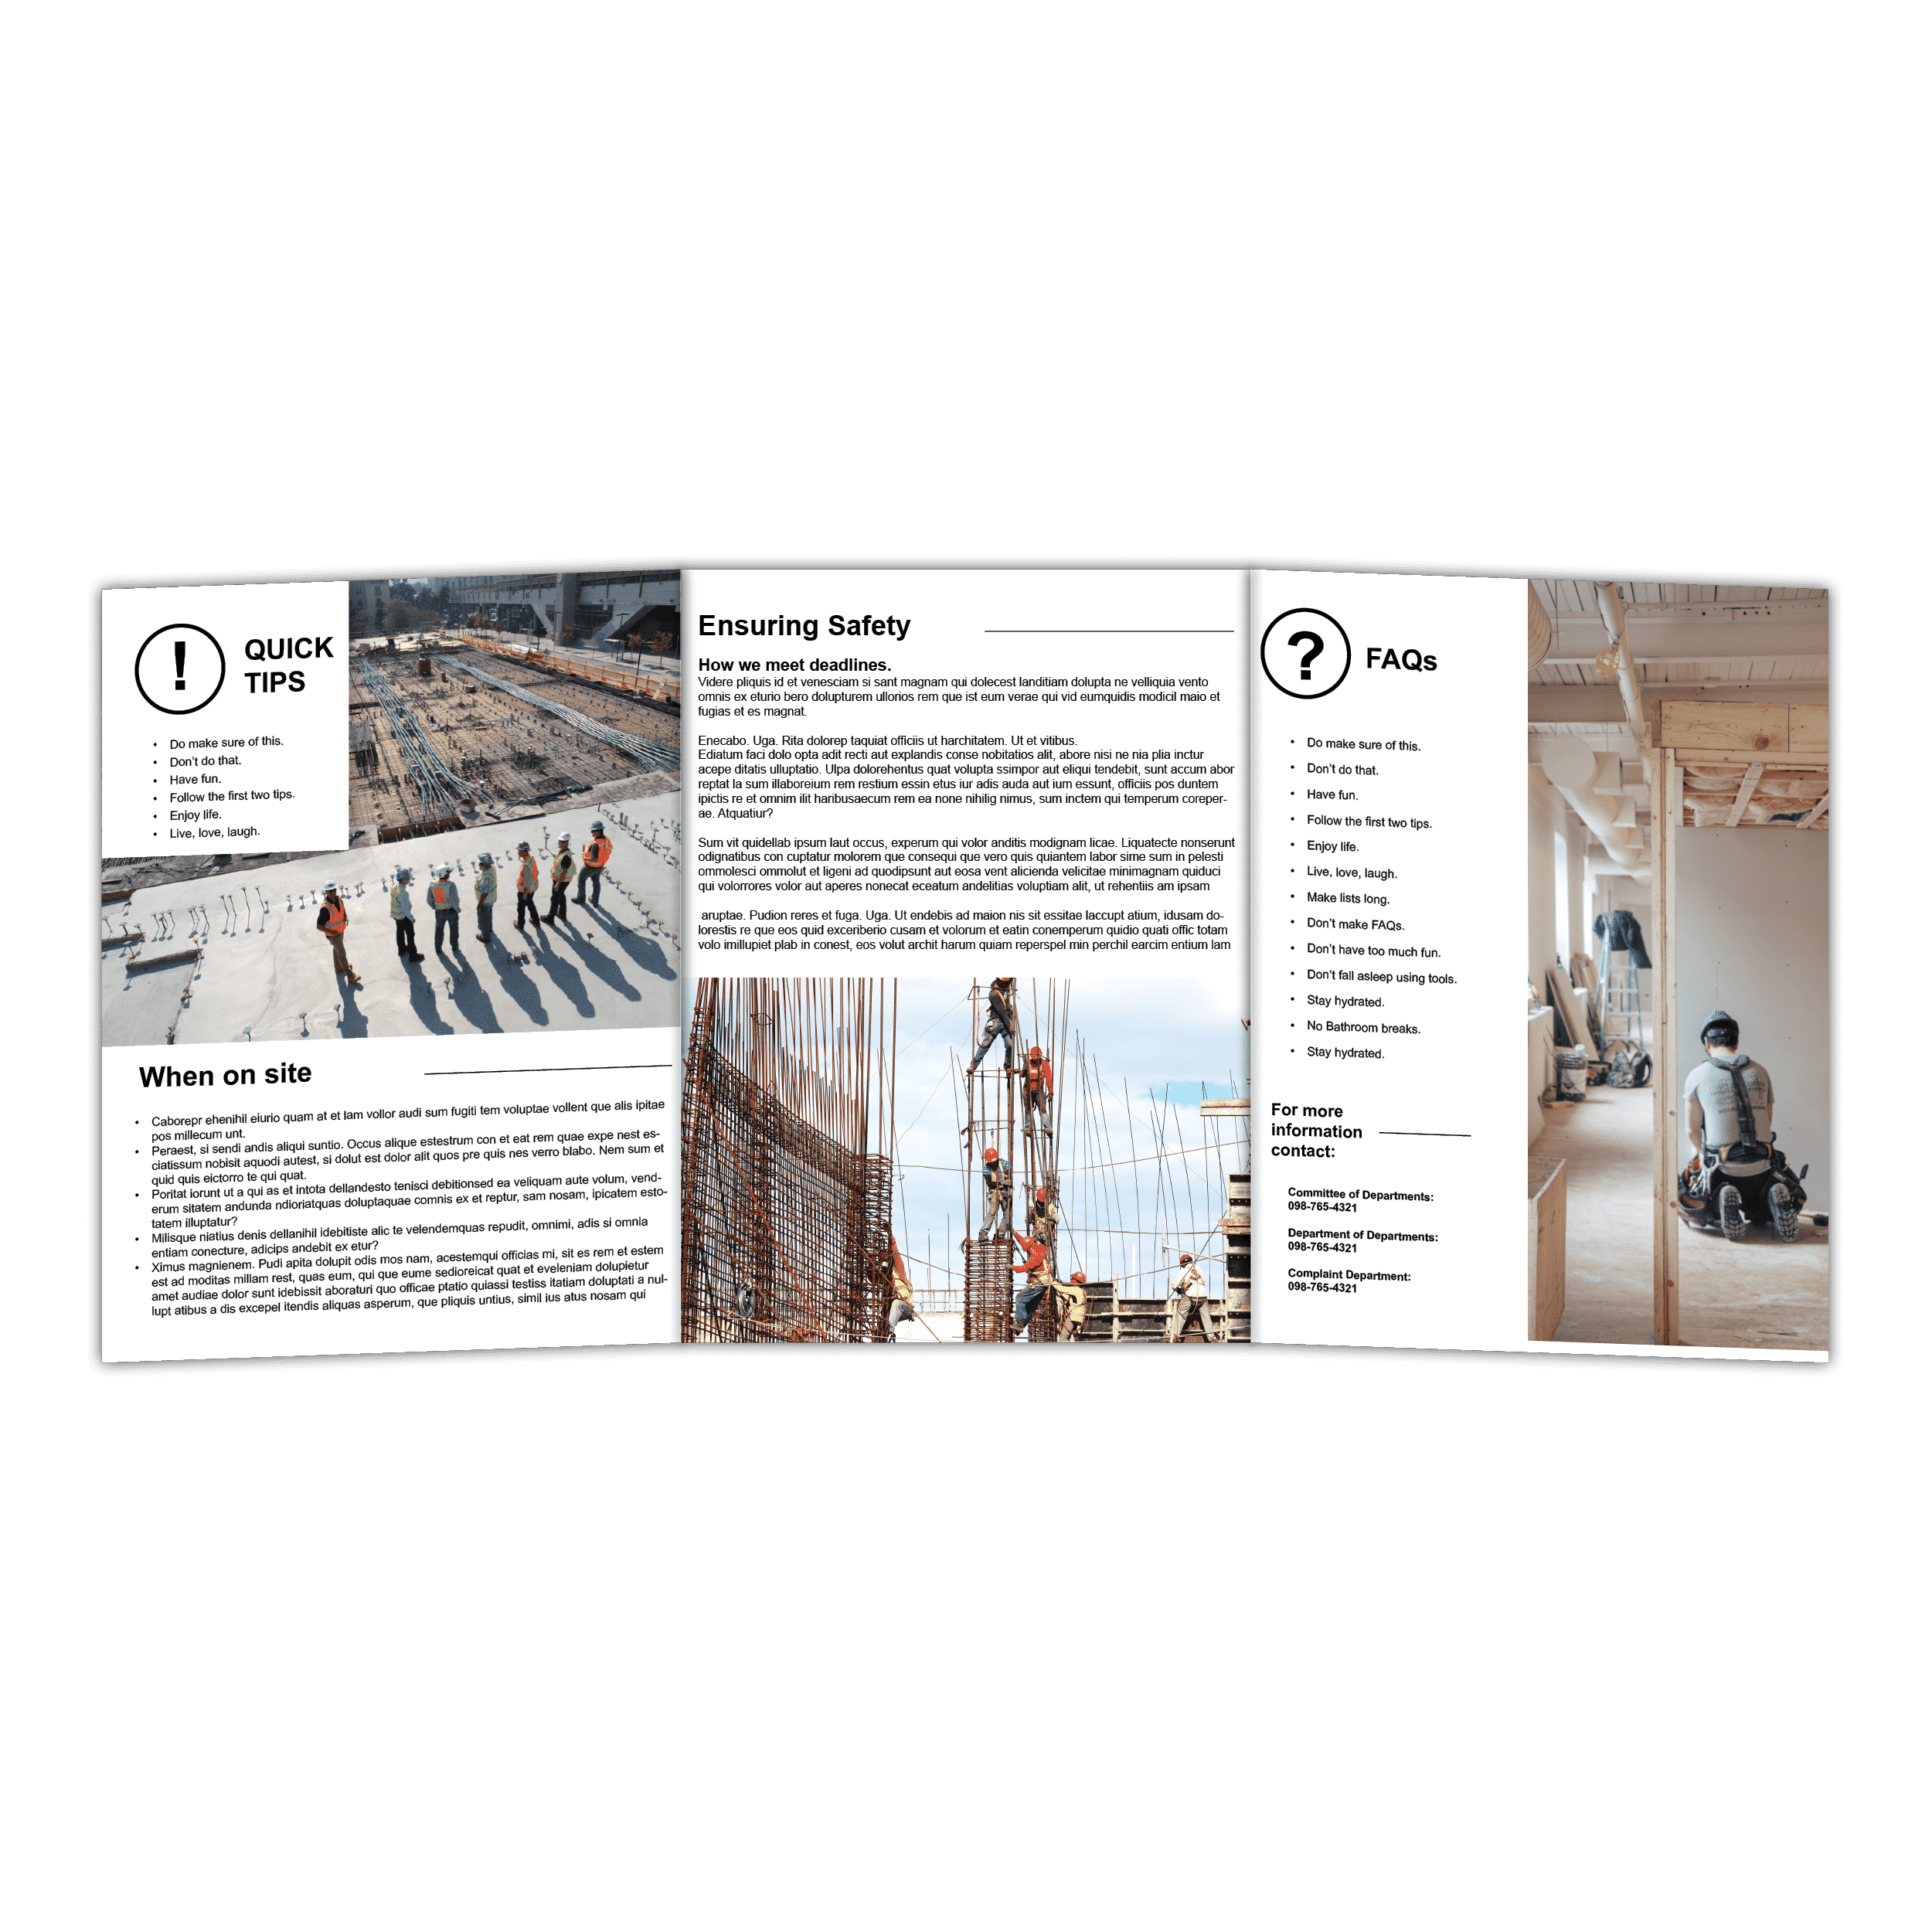 11x25 5 Brochure Printing Full Size 6 Sided Brochure